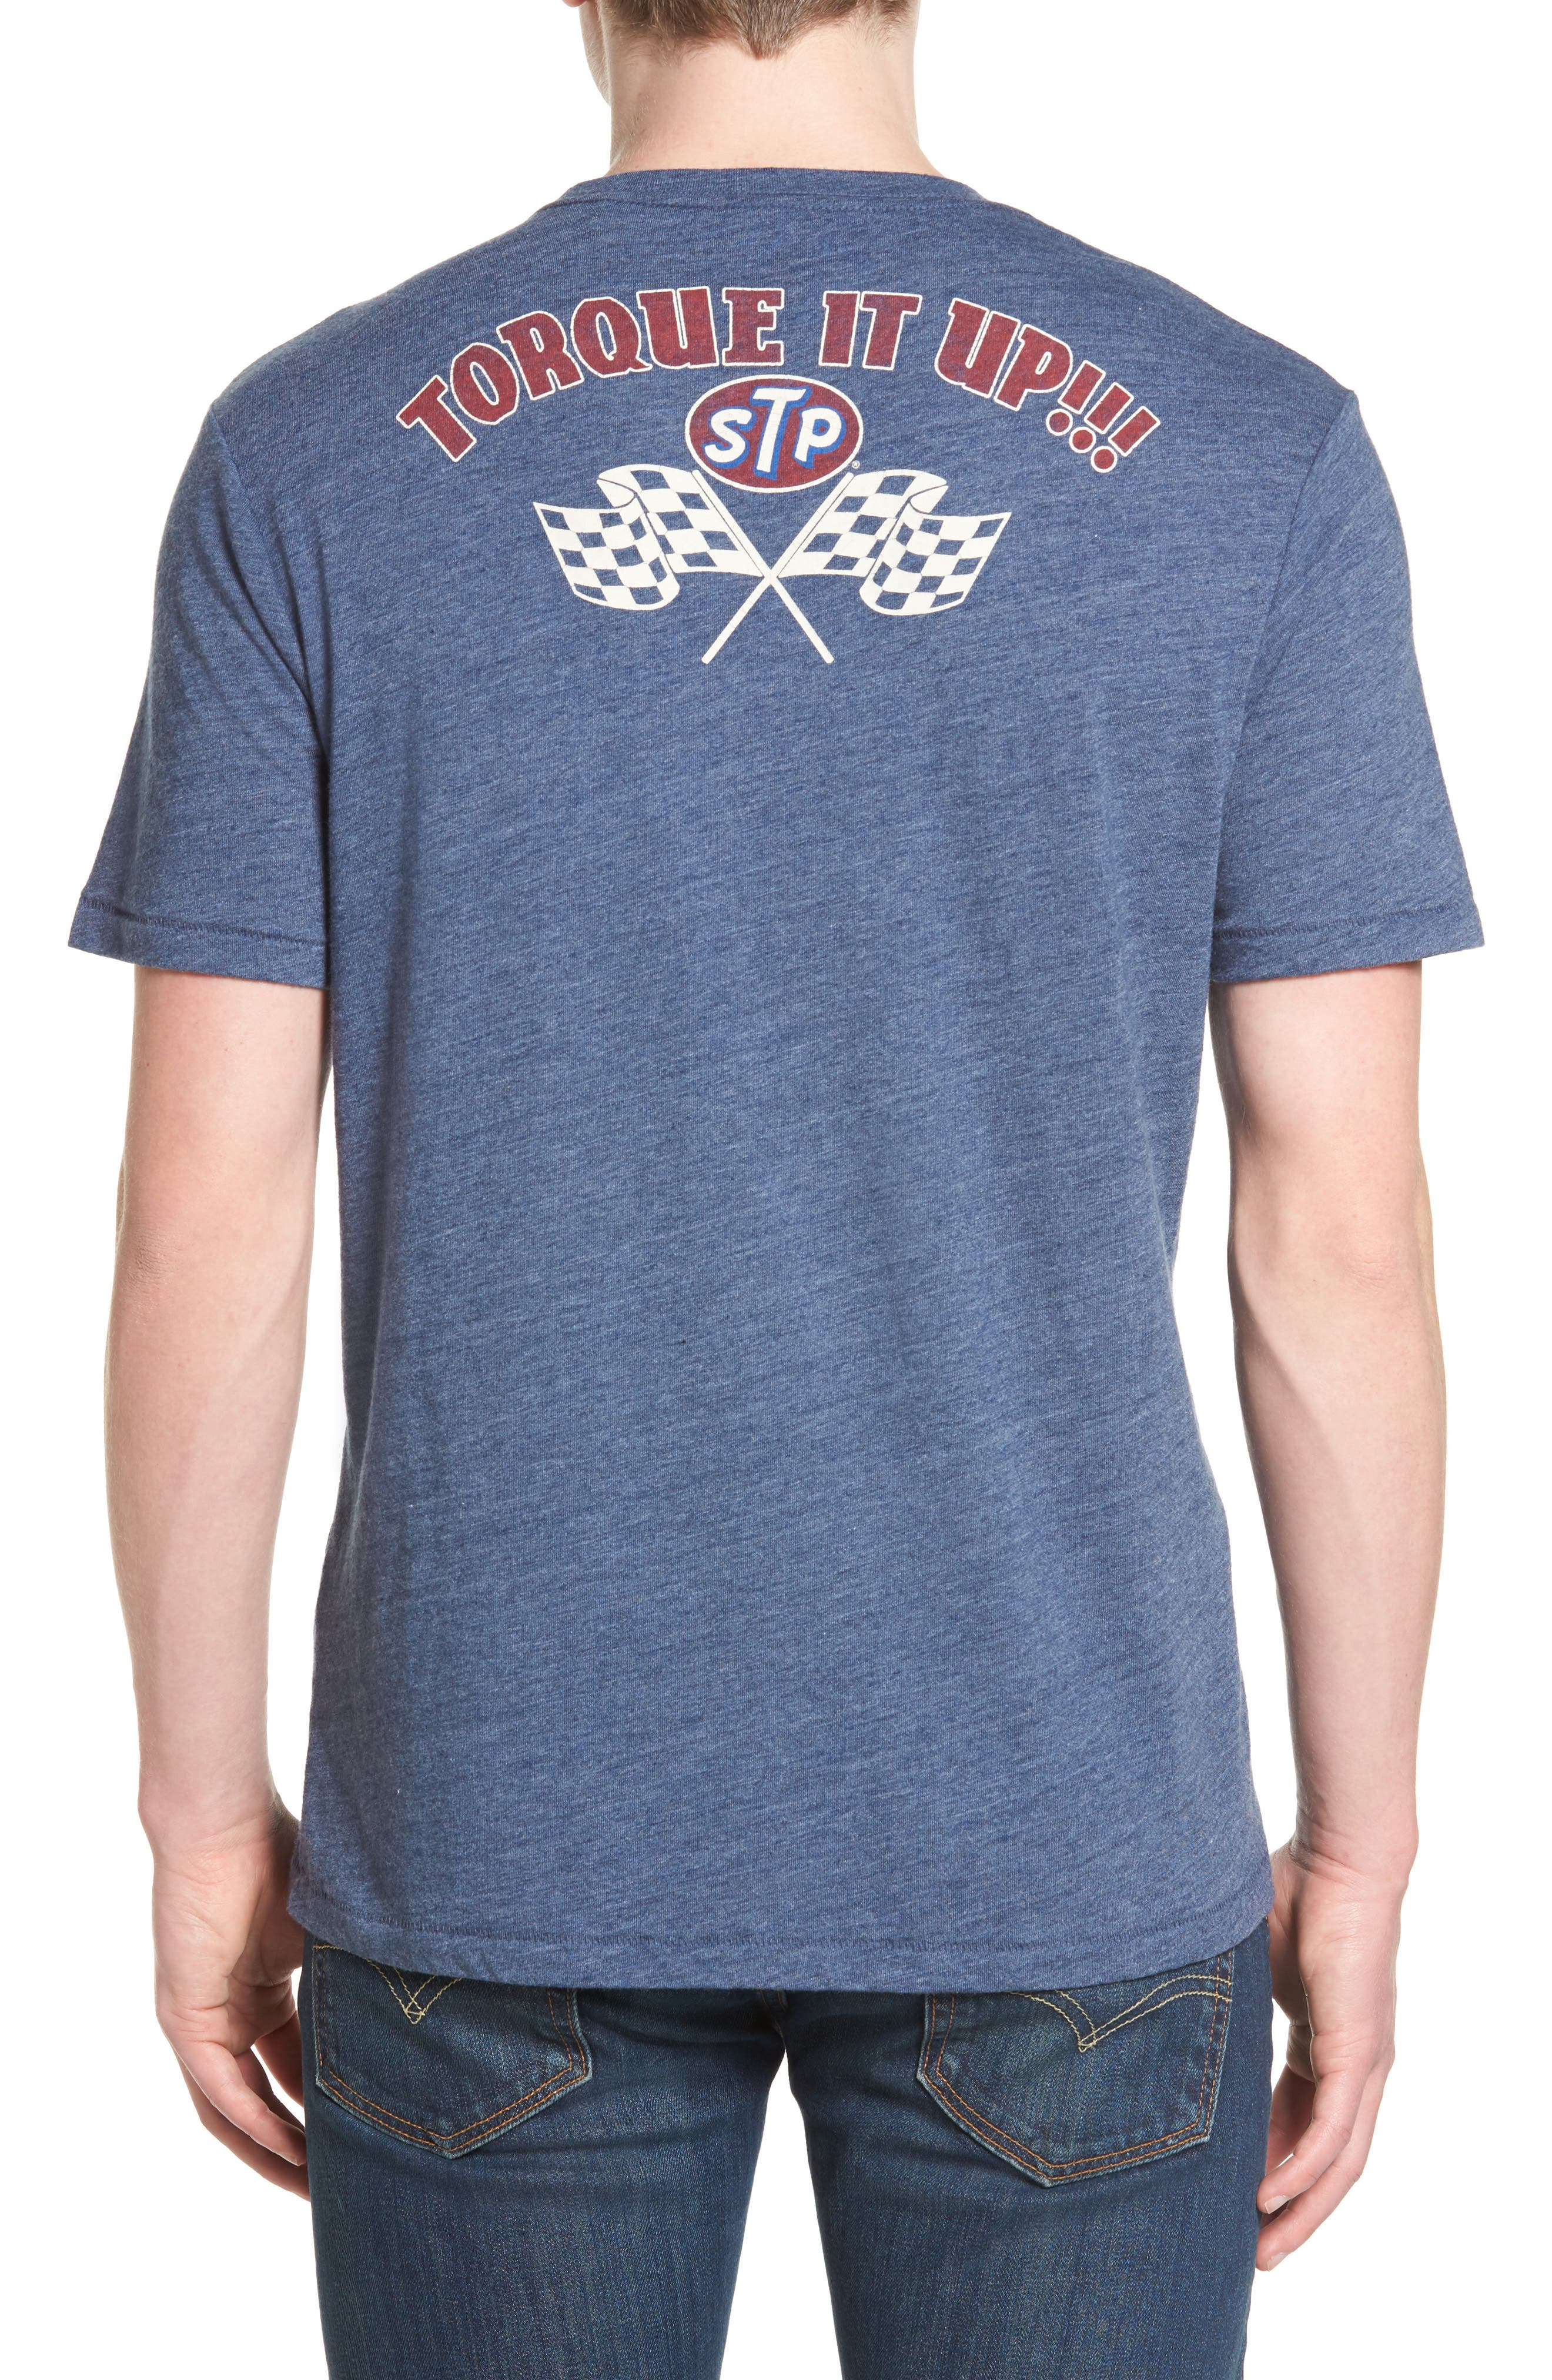 STP Racer's Edge Graphic T-Shirt,                             Alternate thumbnail 2, color,                             410